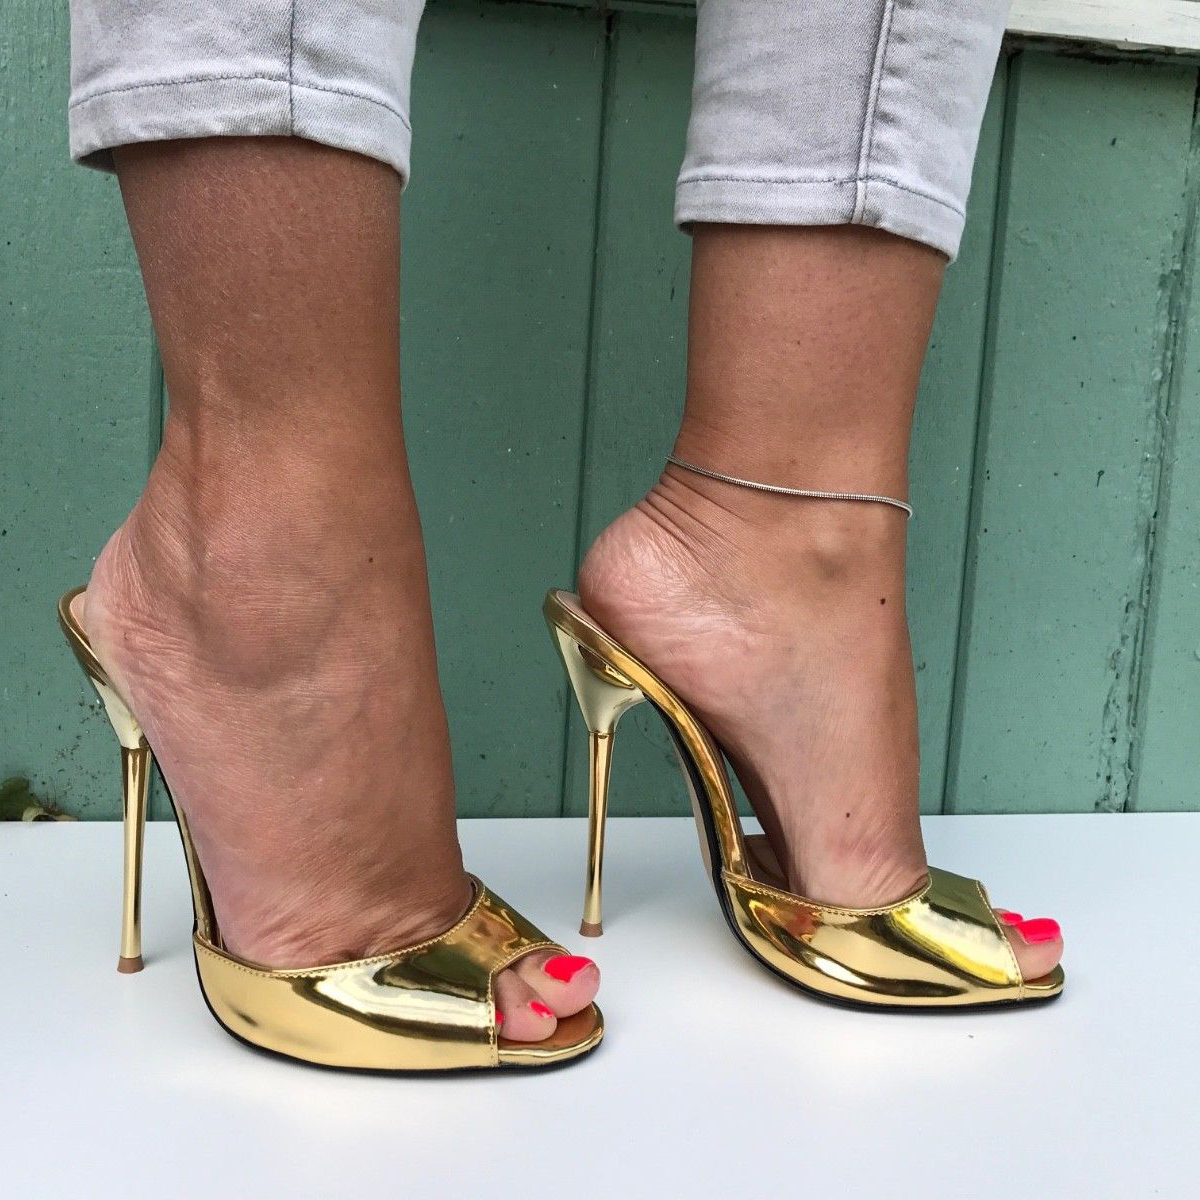 SURU Gold Open Toe High Heels Pumps Women Sexy 13cm Stilettos Sandals